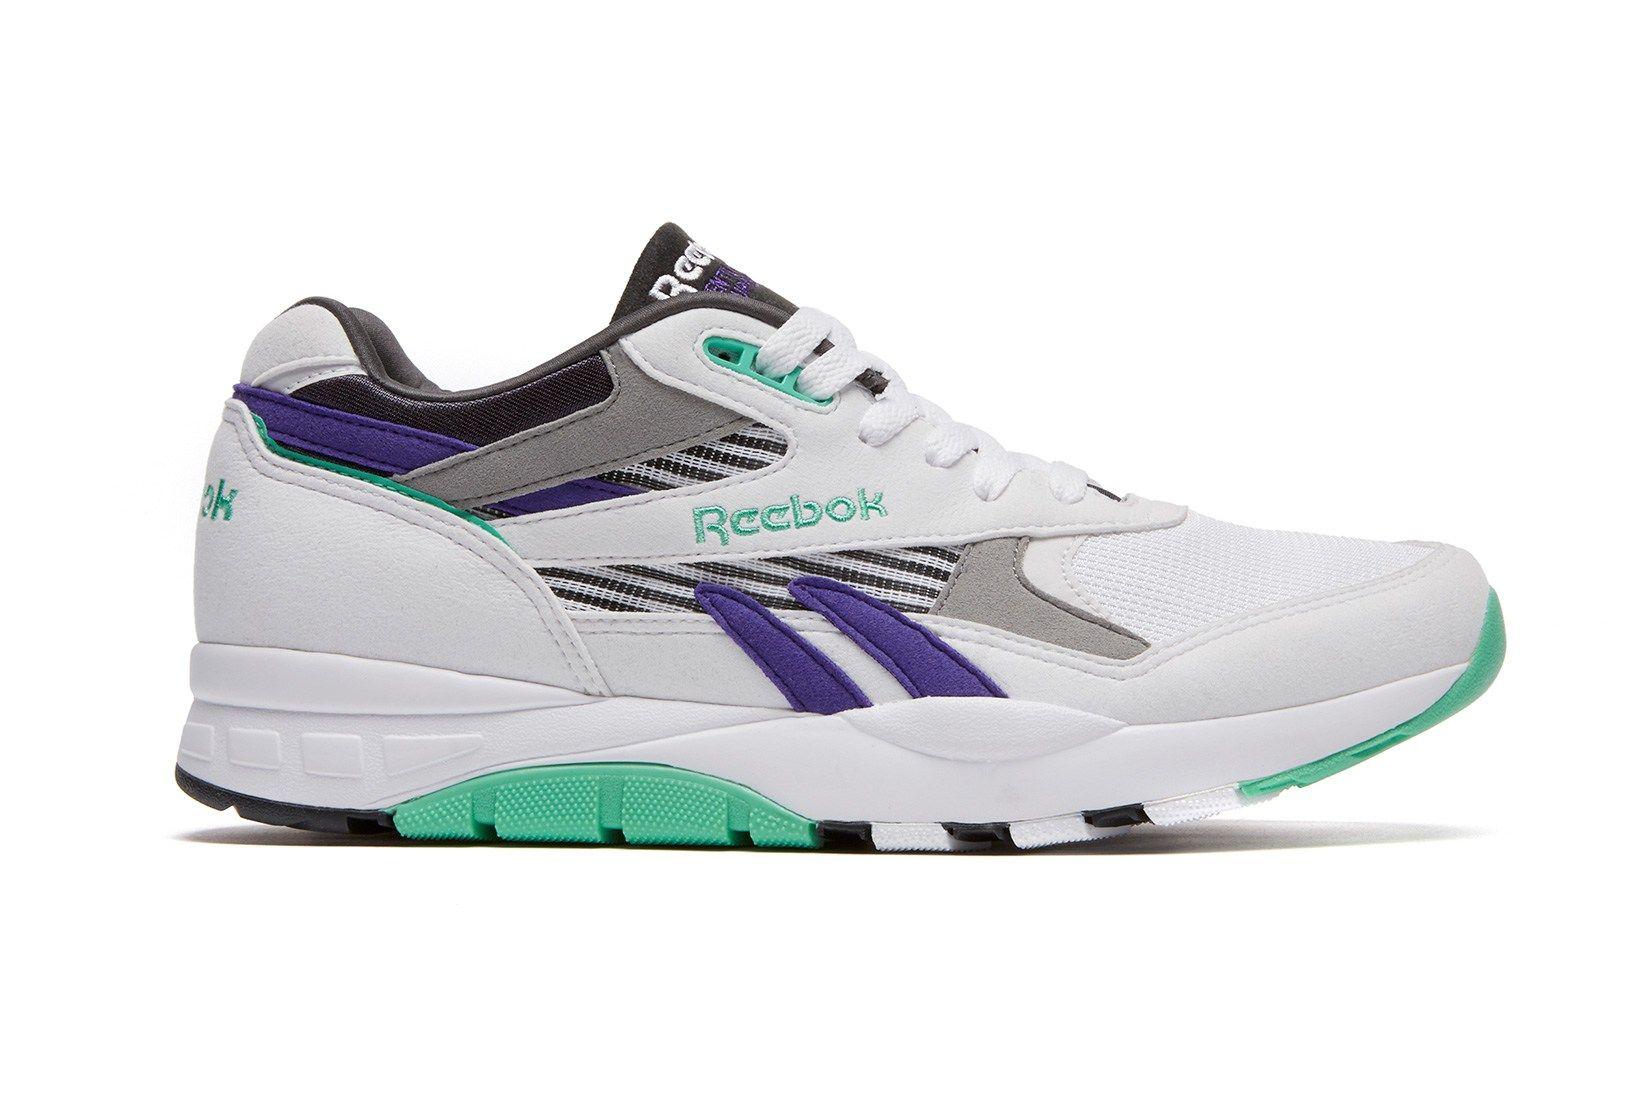 a129a6852c6 Reebok Footwear   Apparel - Be More Human